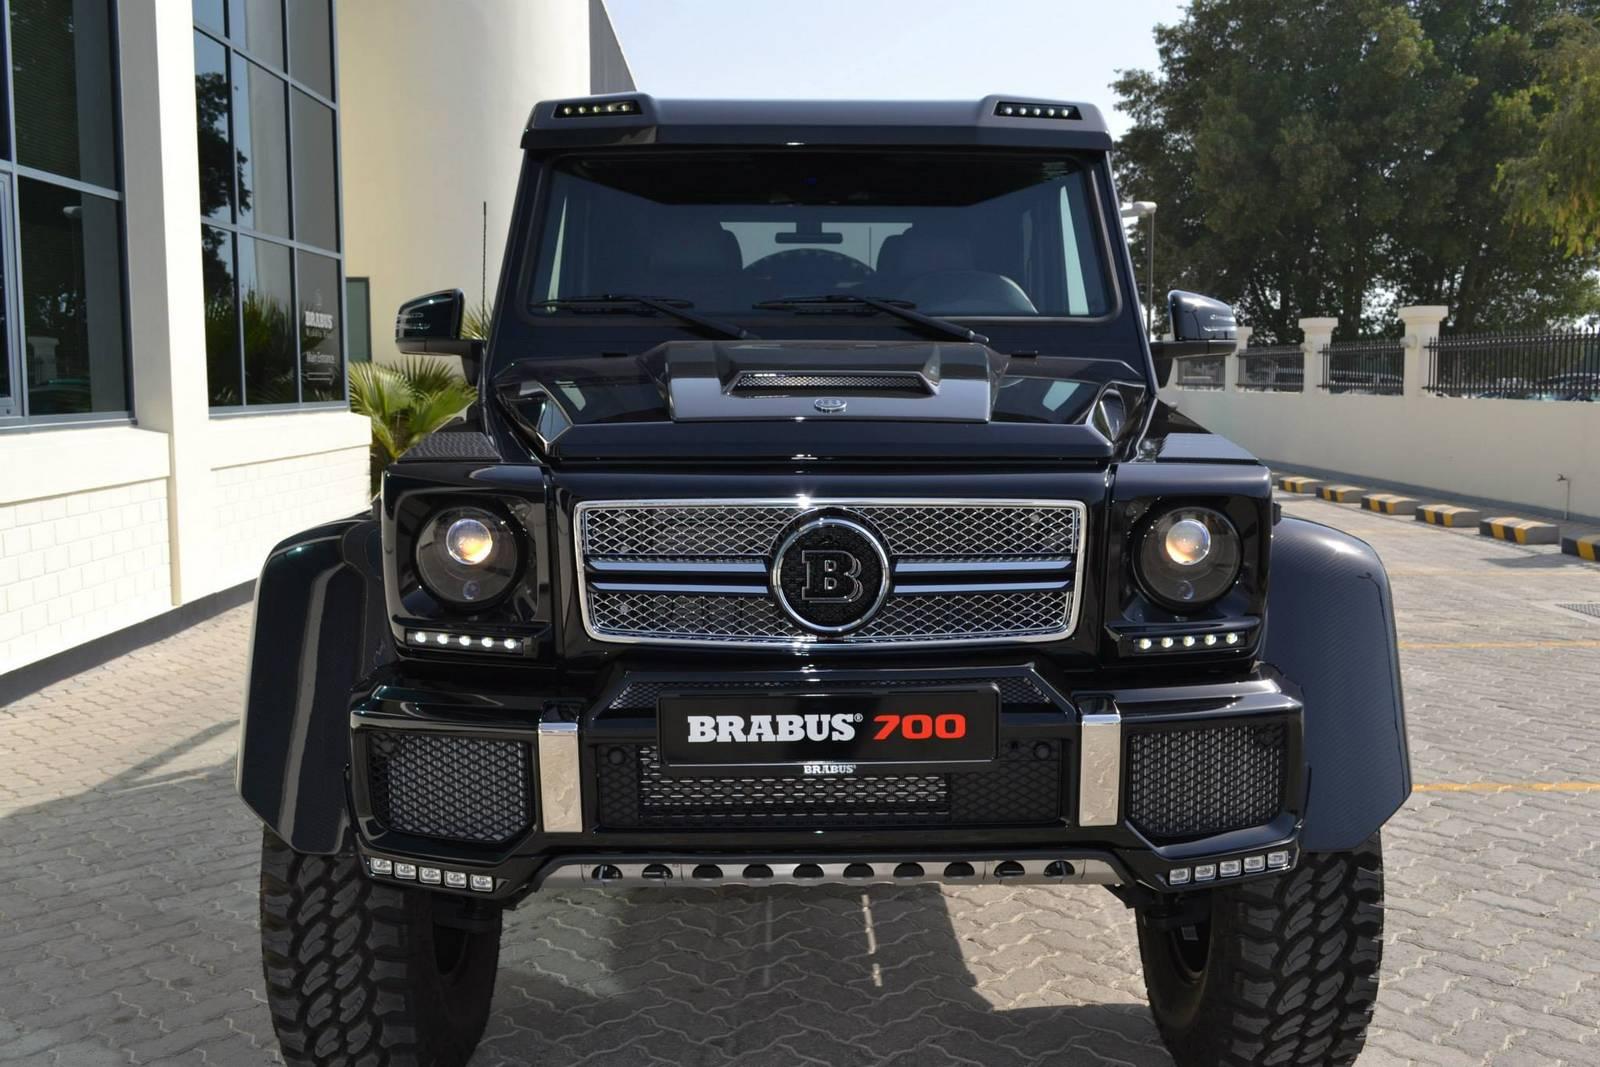 Check Out The Mammoth Brabus B63s 700 6 6 Benzinsider